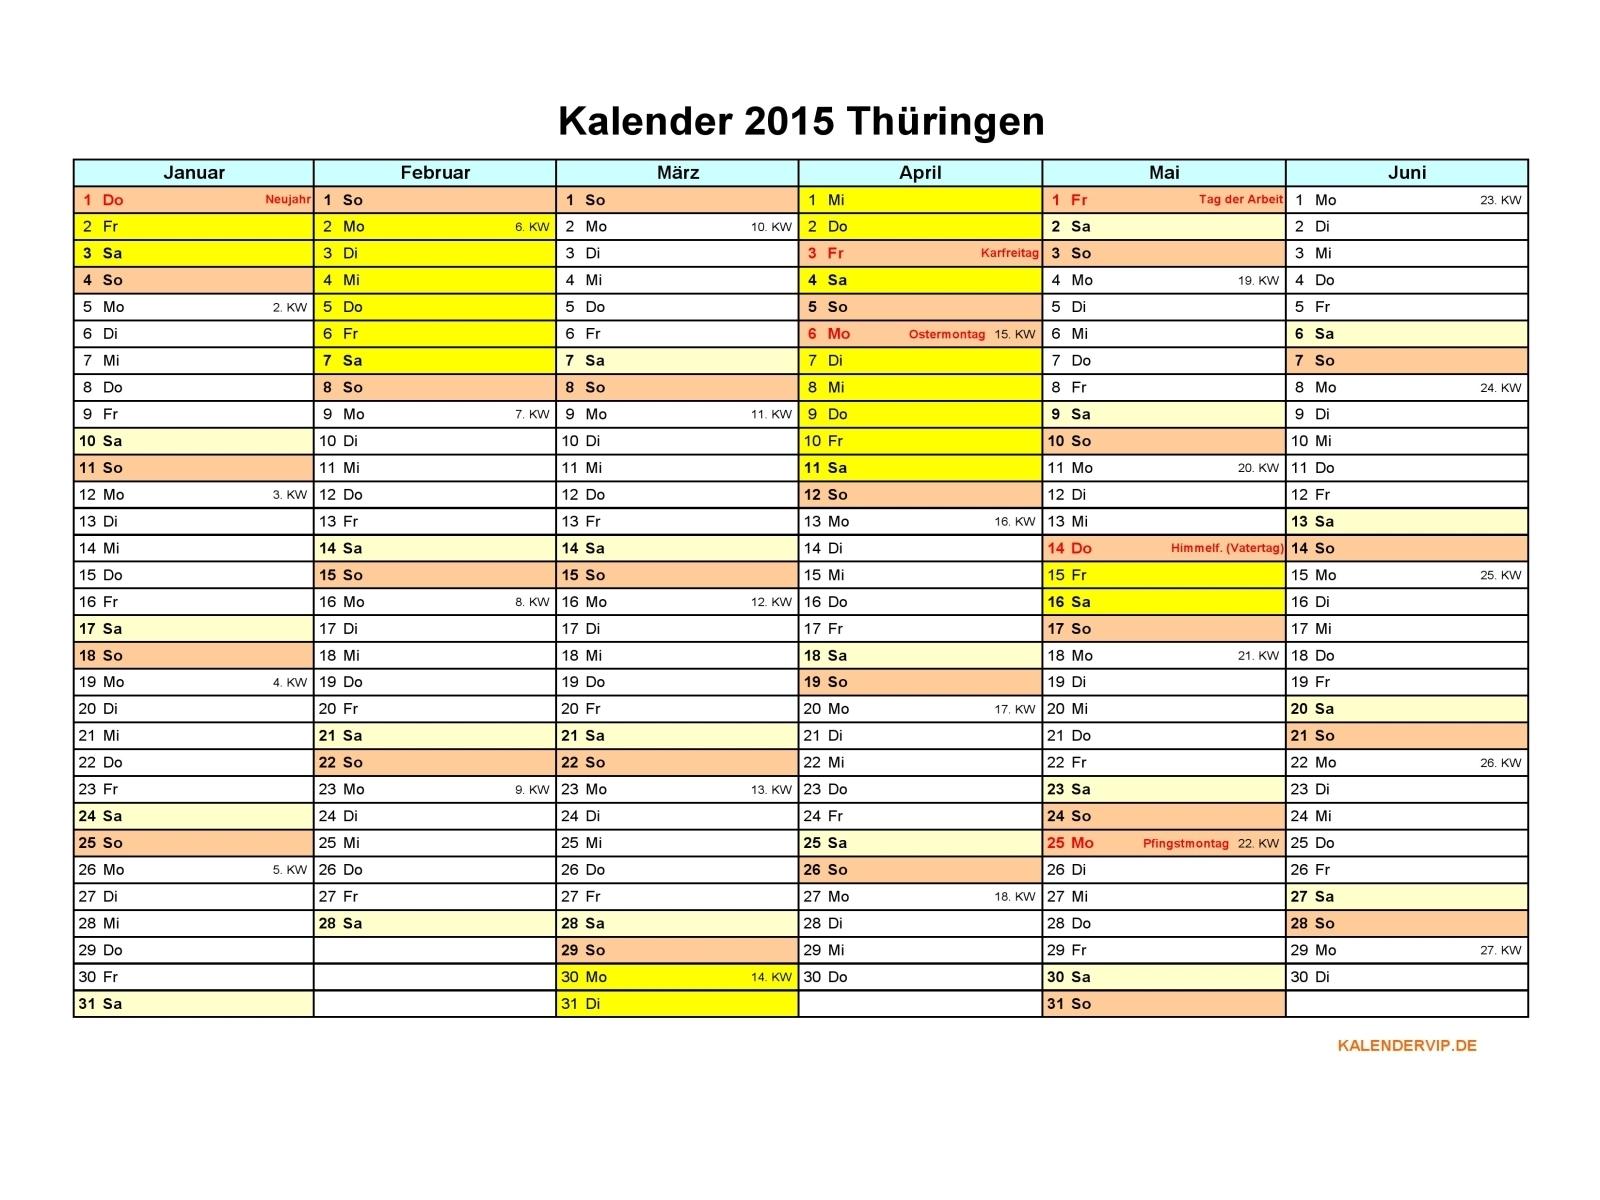 Kalender 2015 Thüringen - KalenderVIP